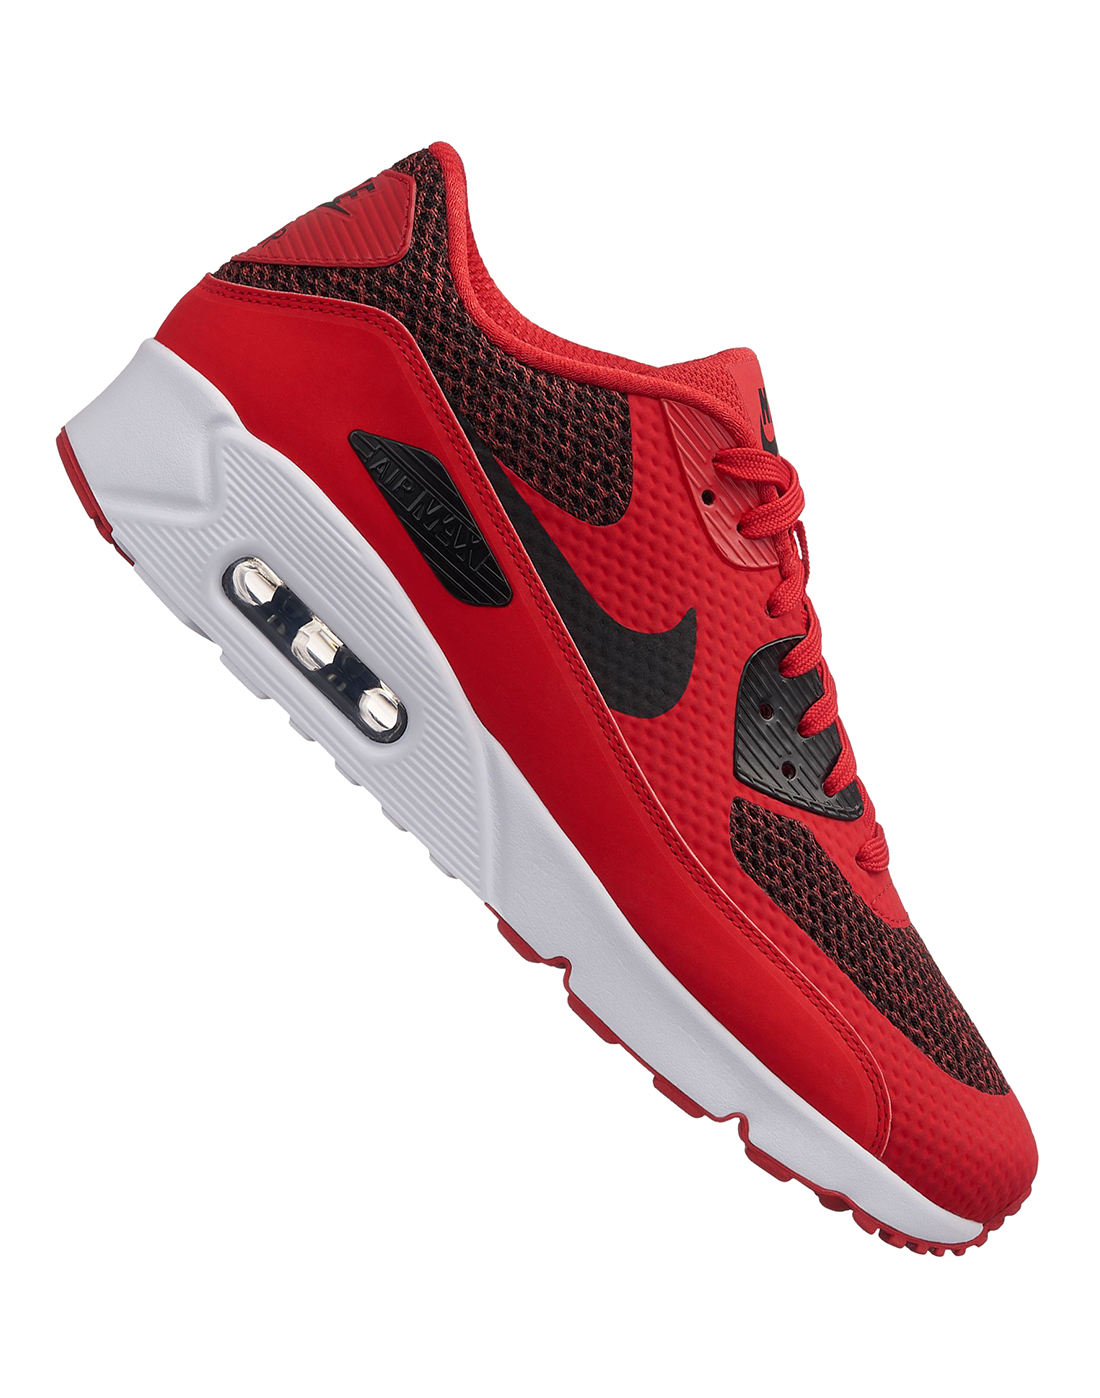 7ff04262db Nike. Mens Air Max 90 Ultra 2.0 Essential. Mens Air Max 90 Ultra 2.0  Essential ...